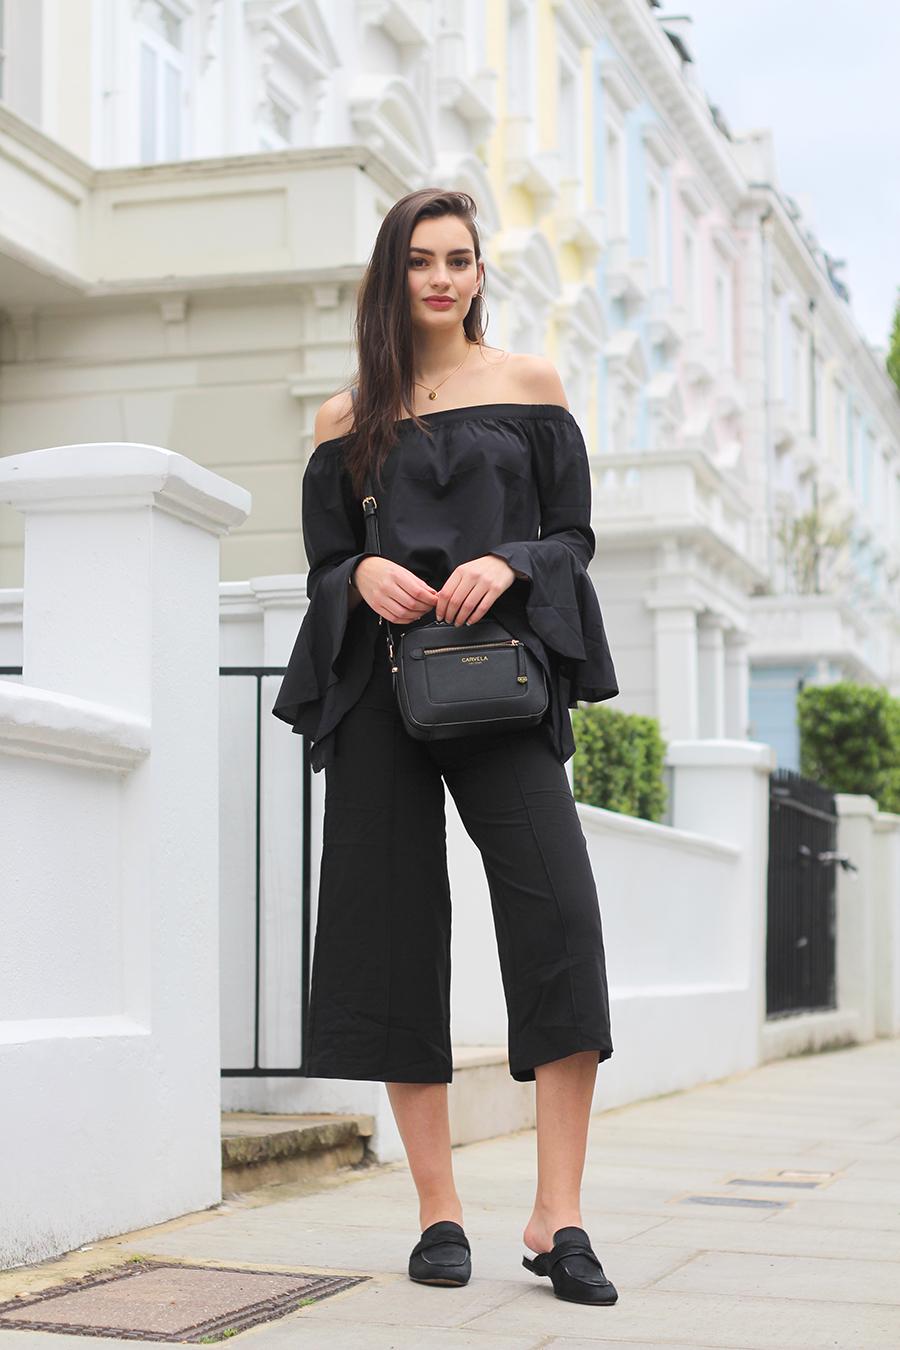 peexo spring style all black london